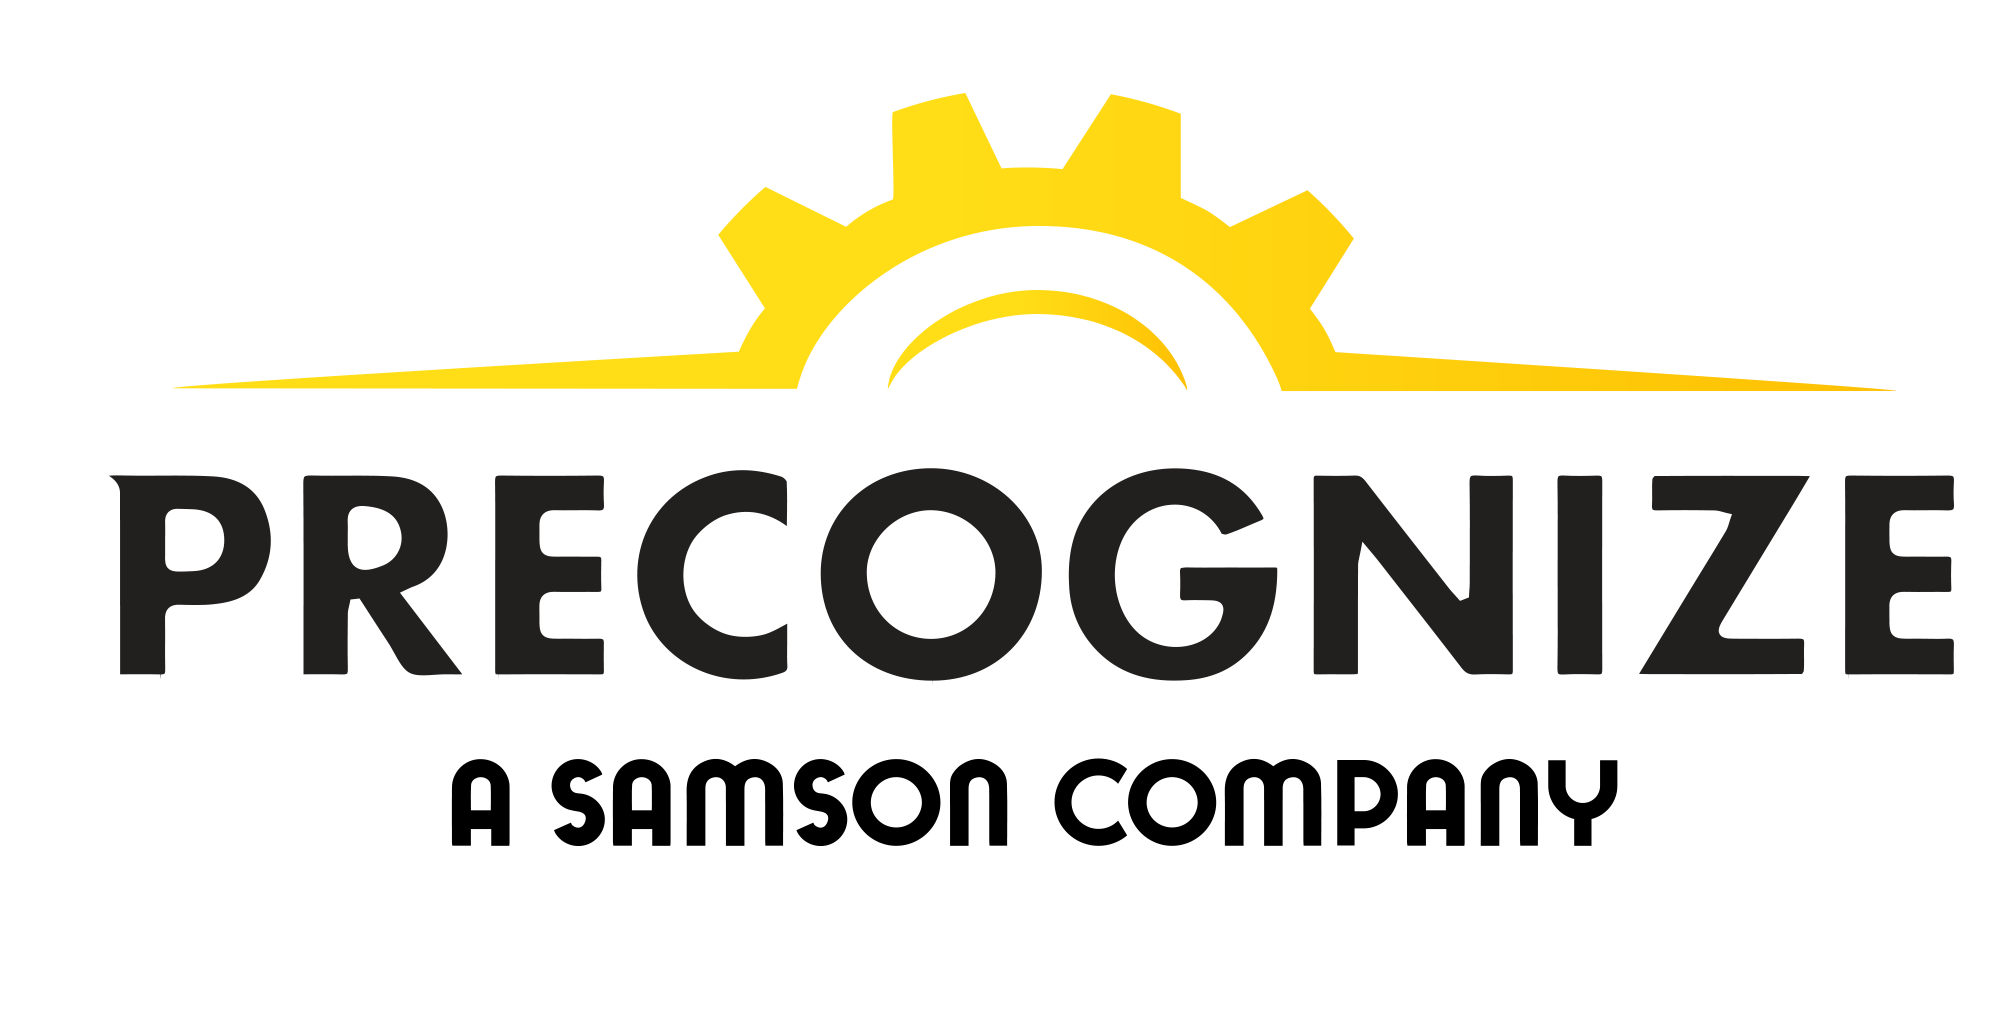 precognize-logo w samson_Rec-2